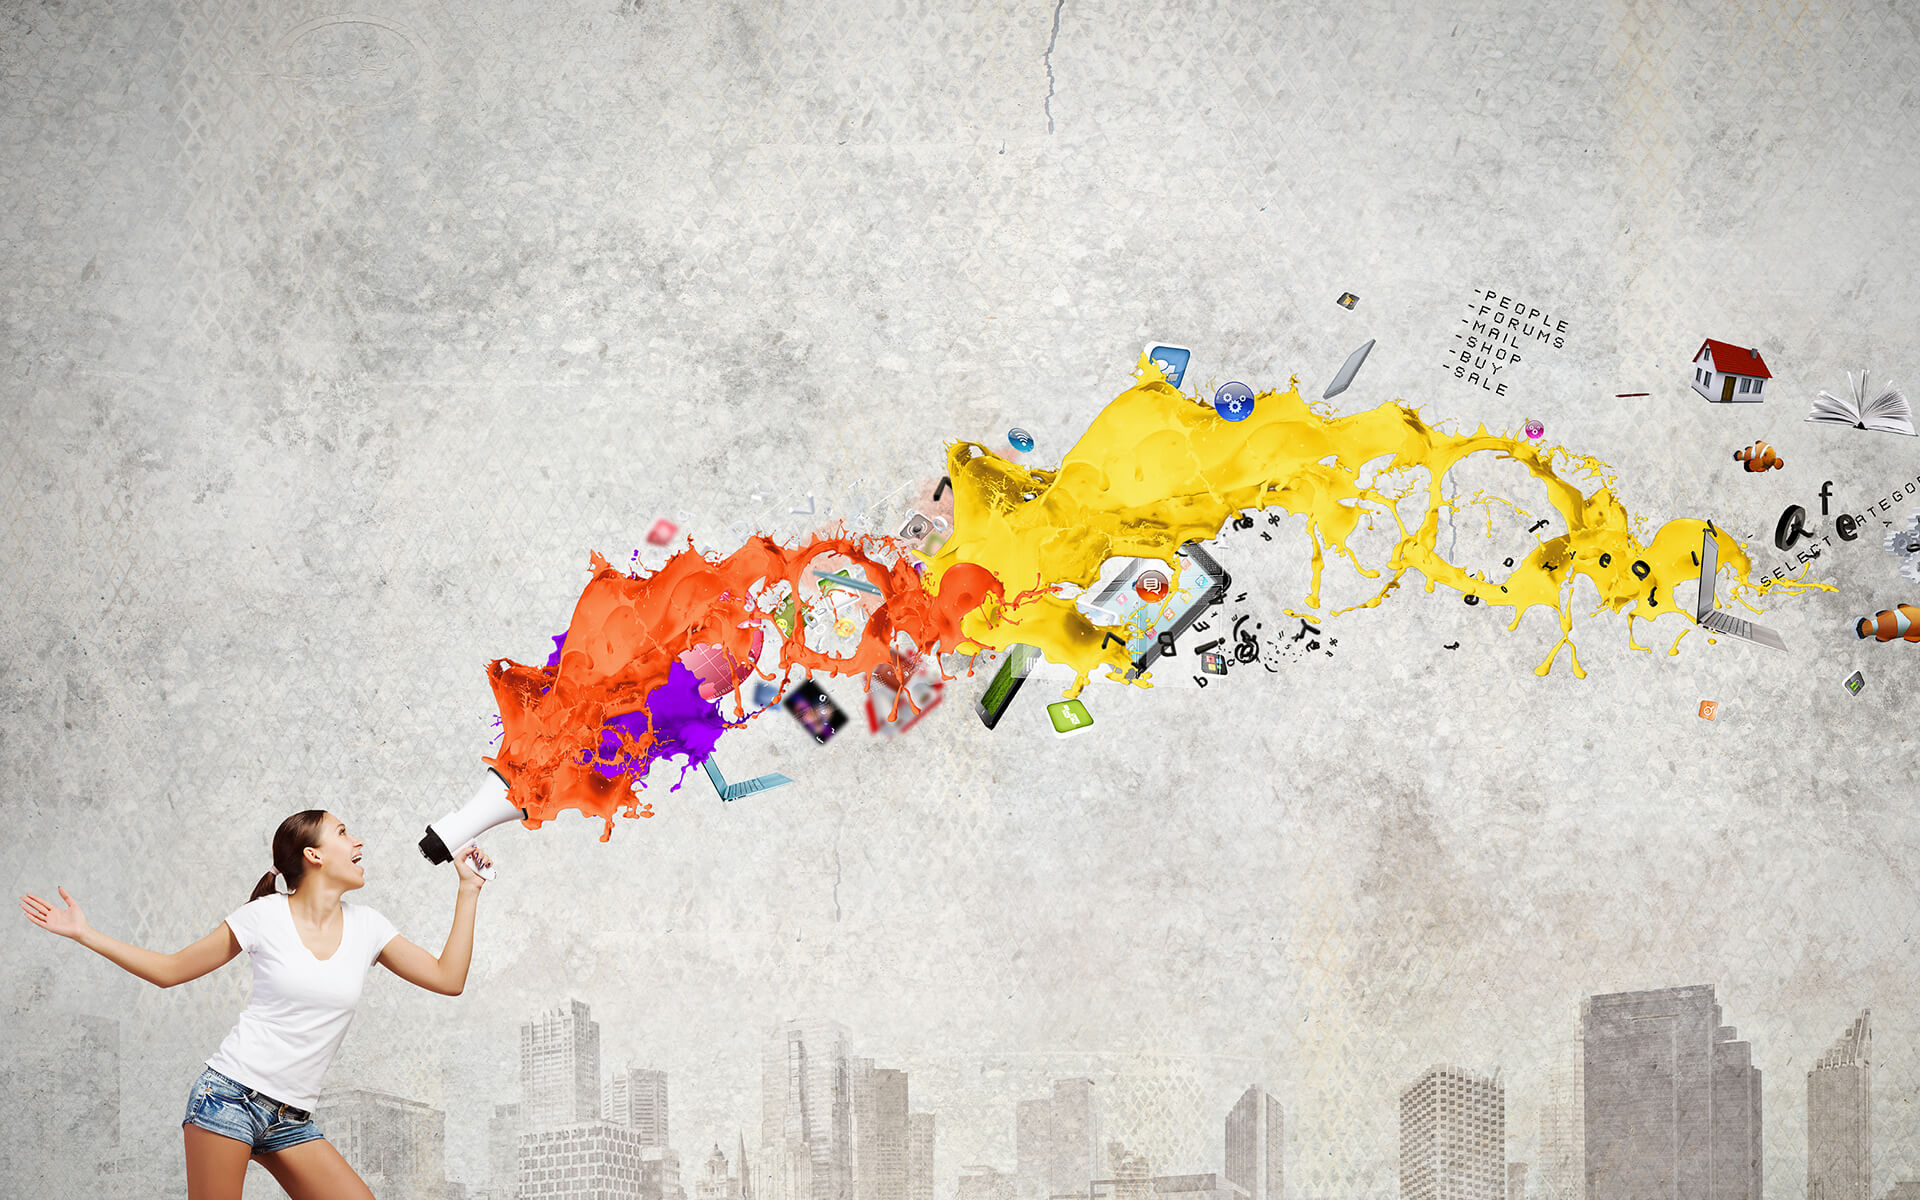 marketing consultant, digital marketing, business strategy, digital transformation, marketing strategy.